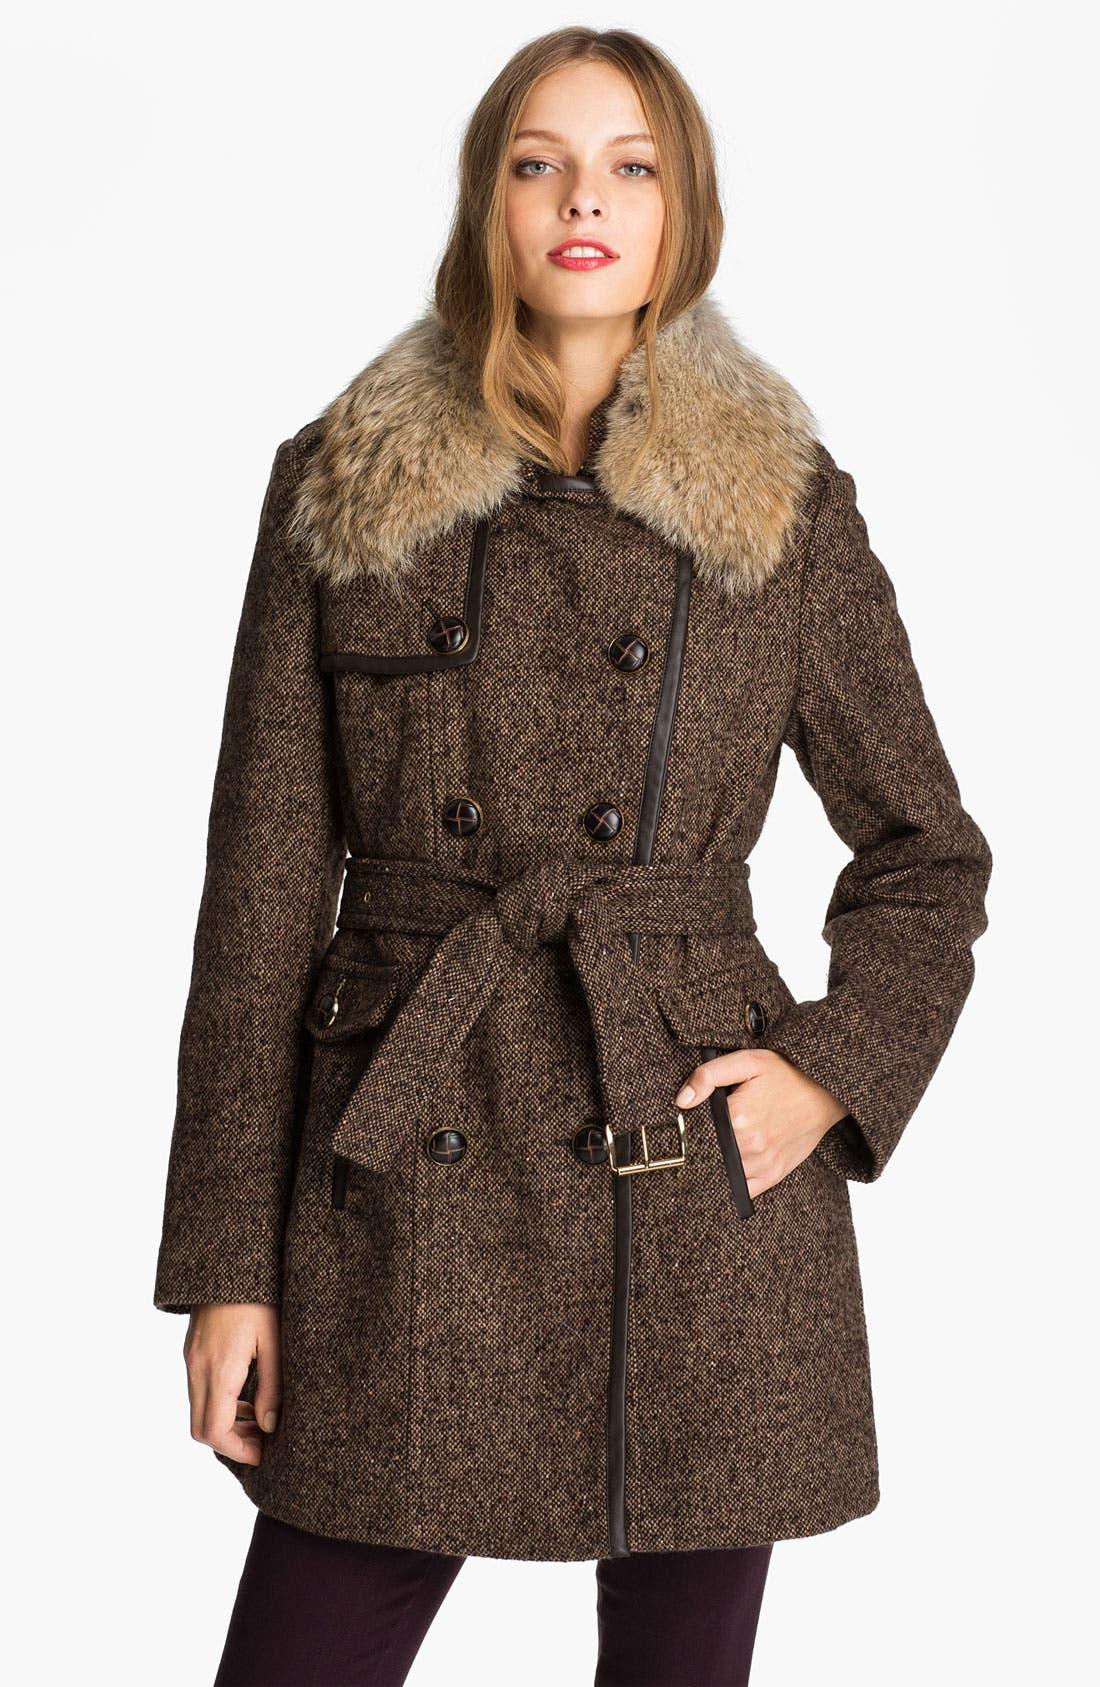 Main Image - MICHAEL Michael Kors Belted Tweed Coat with Genuine Coyote Fur